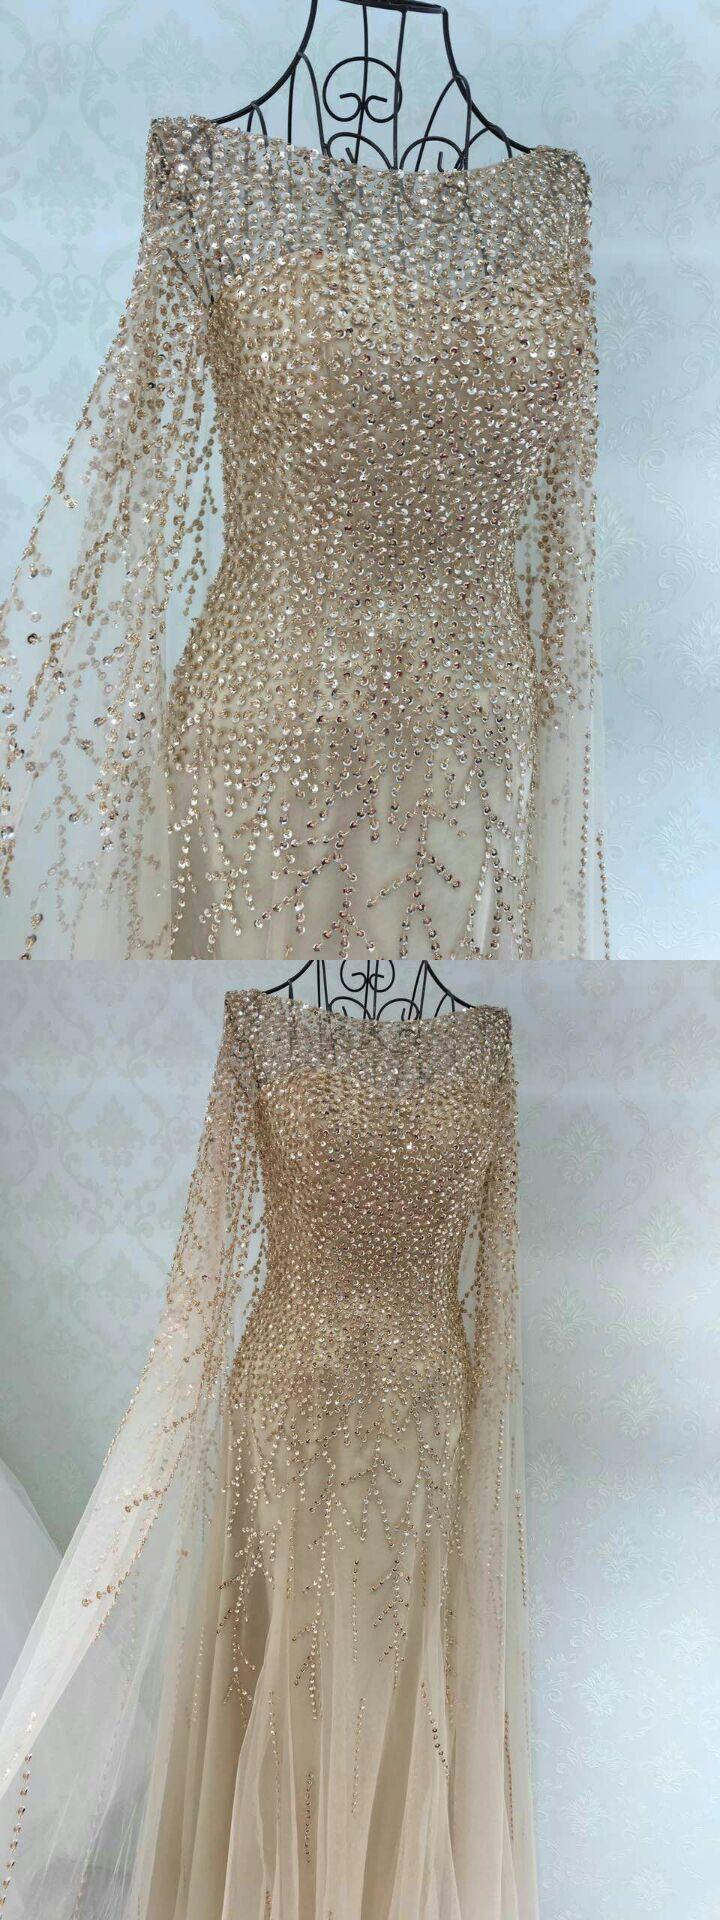 Fairy dress champagne long prom dress long sleeves prom dress